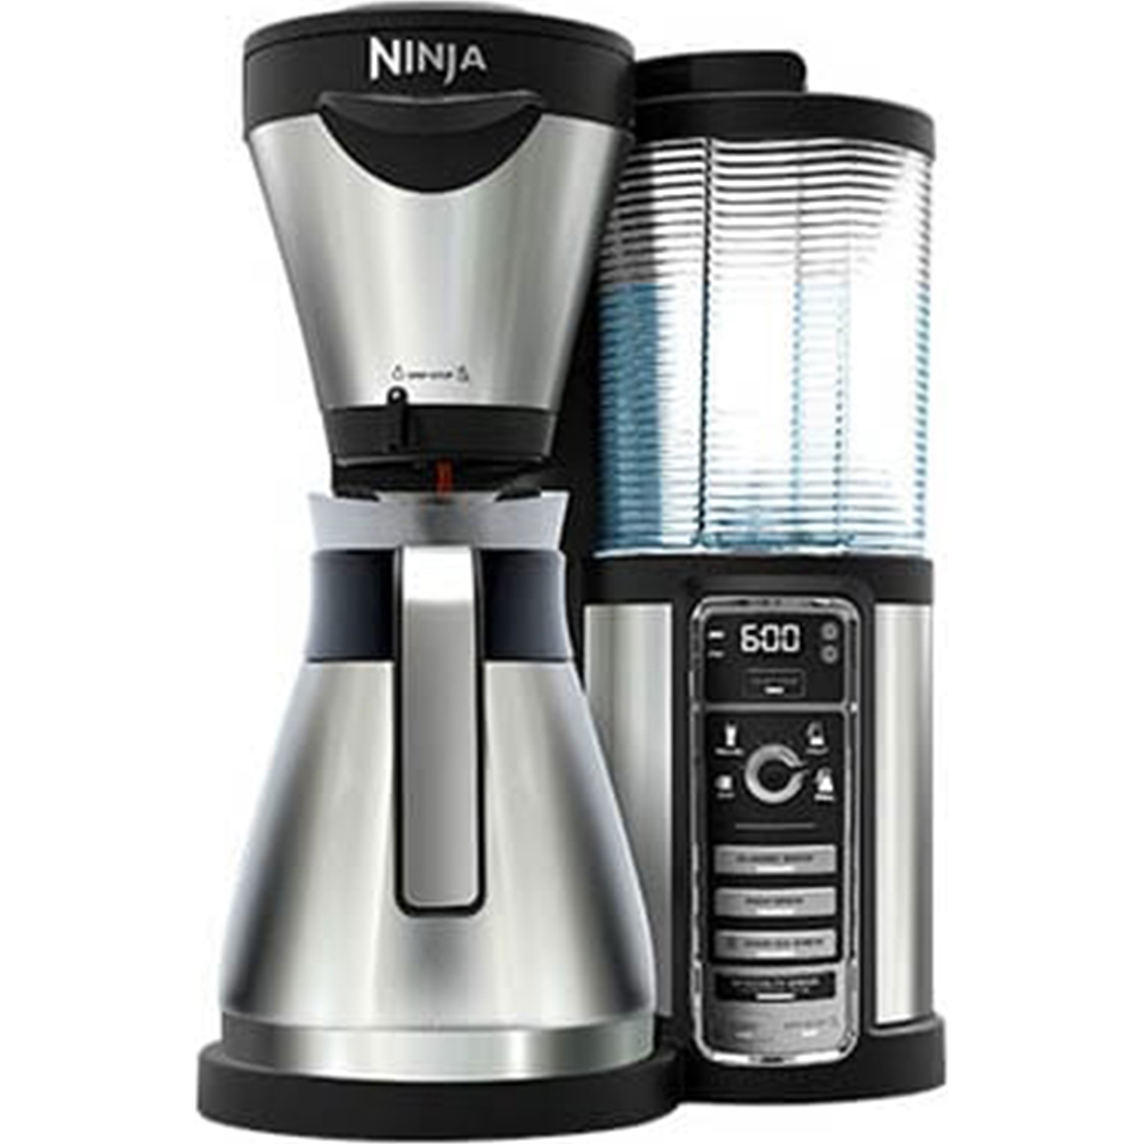 Refurbished Ninja Coffee Bar with Auto IQ and Thermal Carafe, CF085